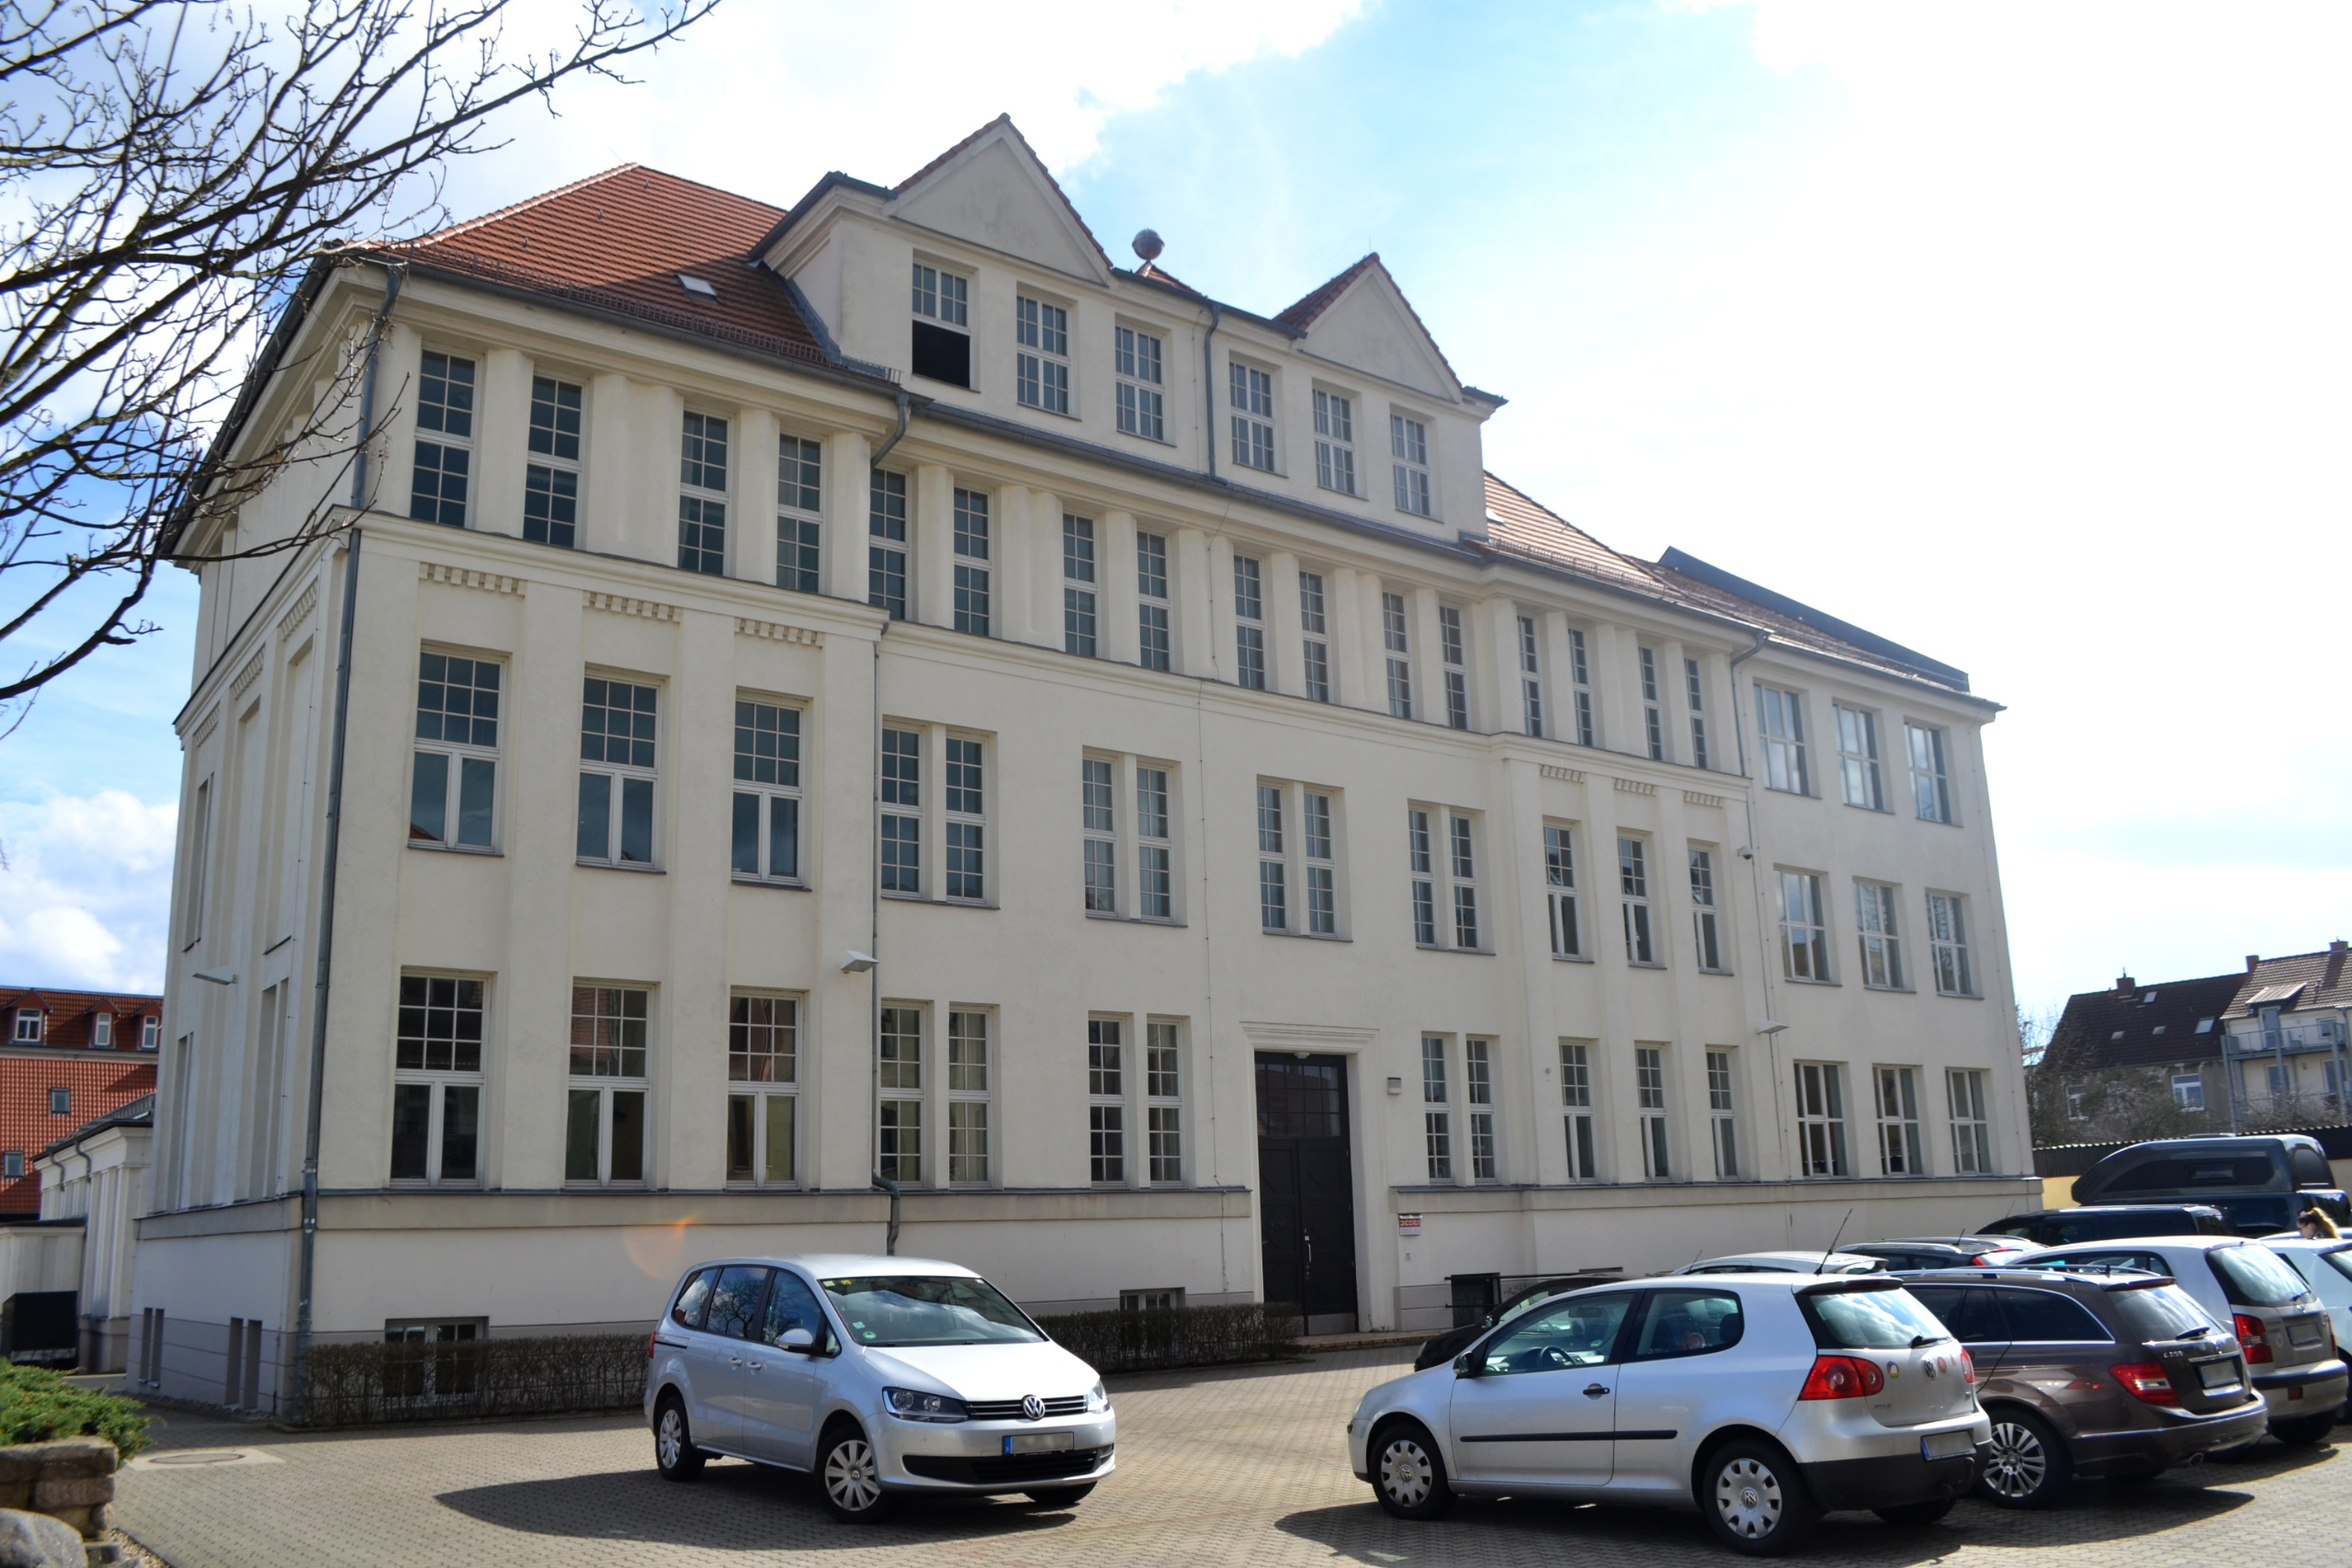 Berufliche schulen landeshauptstadt schwerin for Schule design